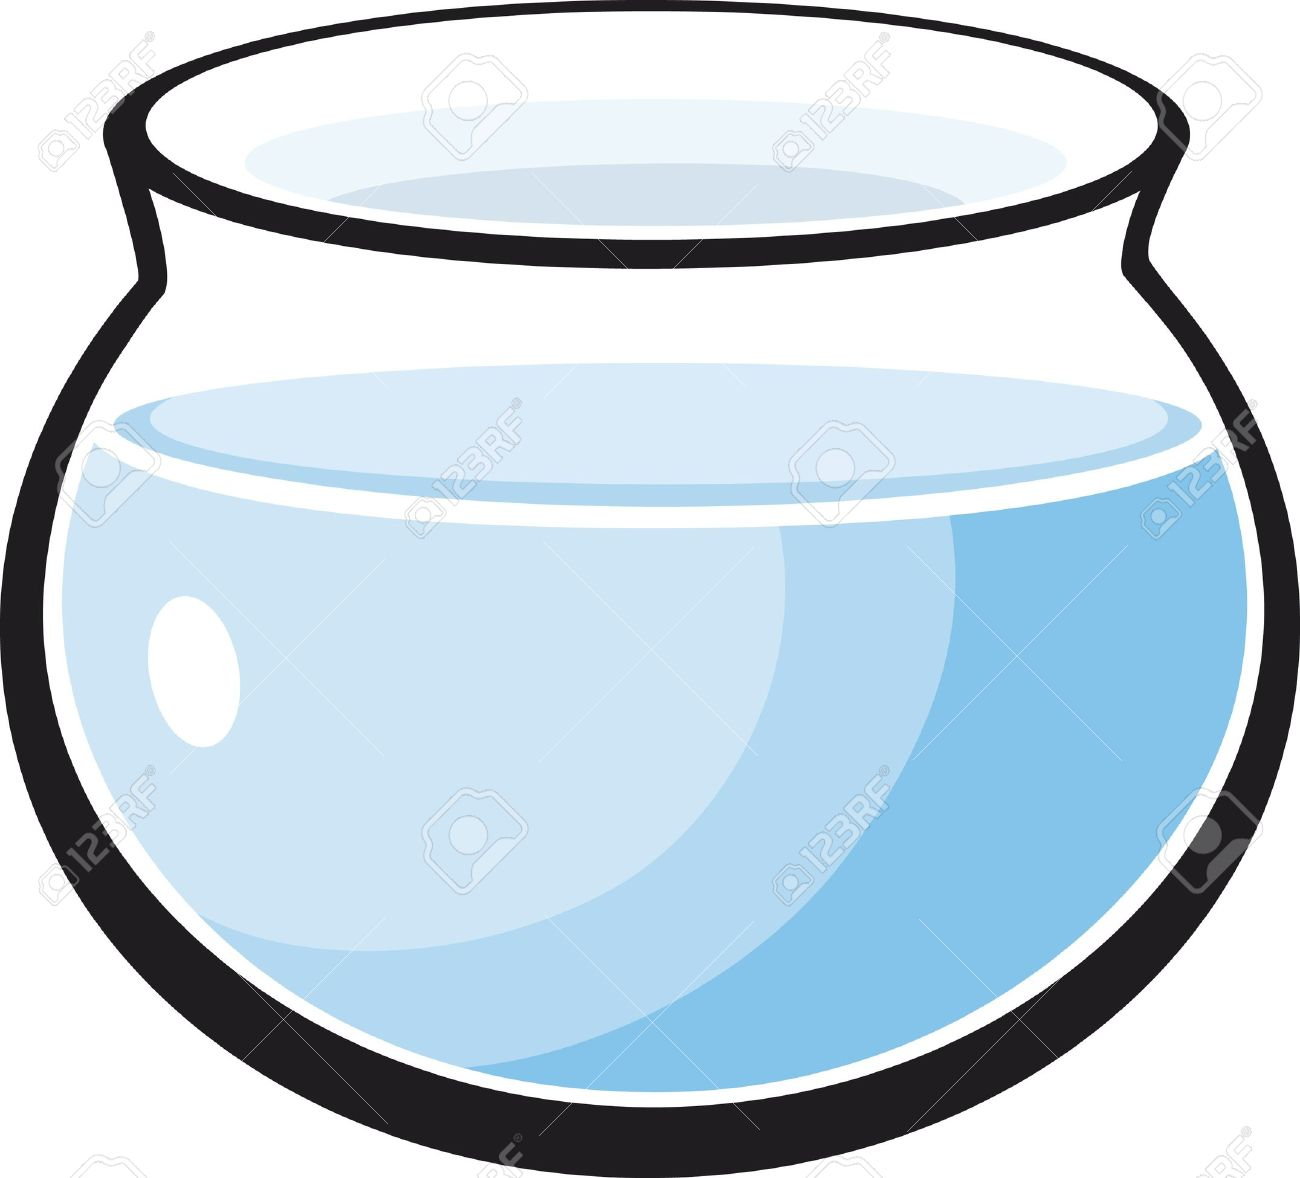 cartoon Illustration of empty fish tank.